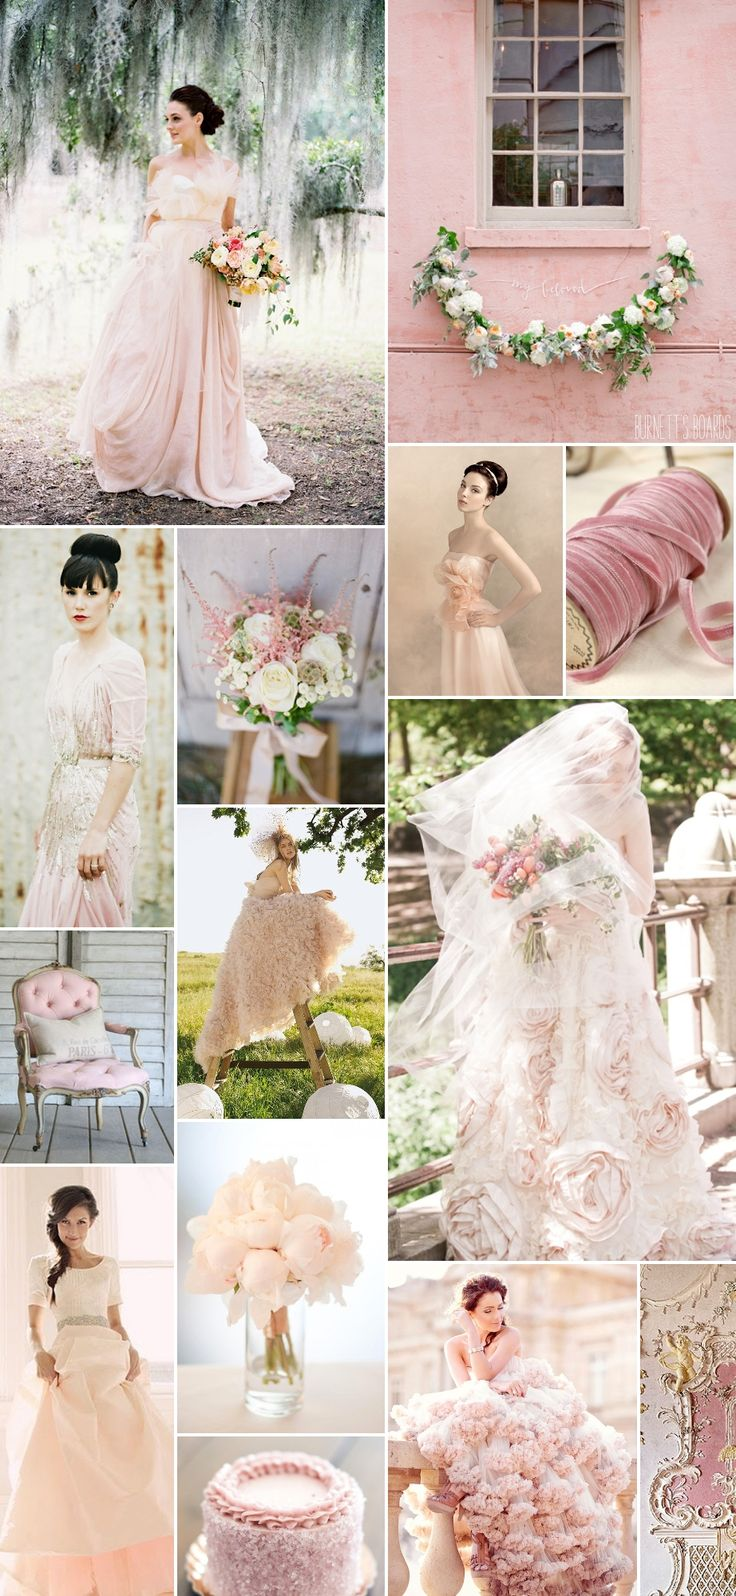 best images about dresses on pinterest ruffles lavender